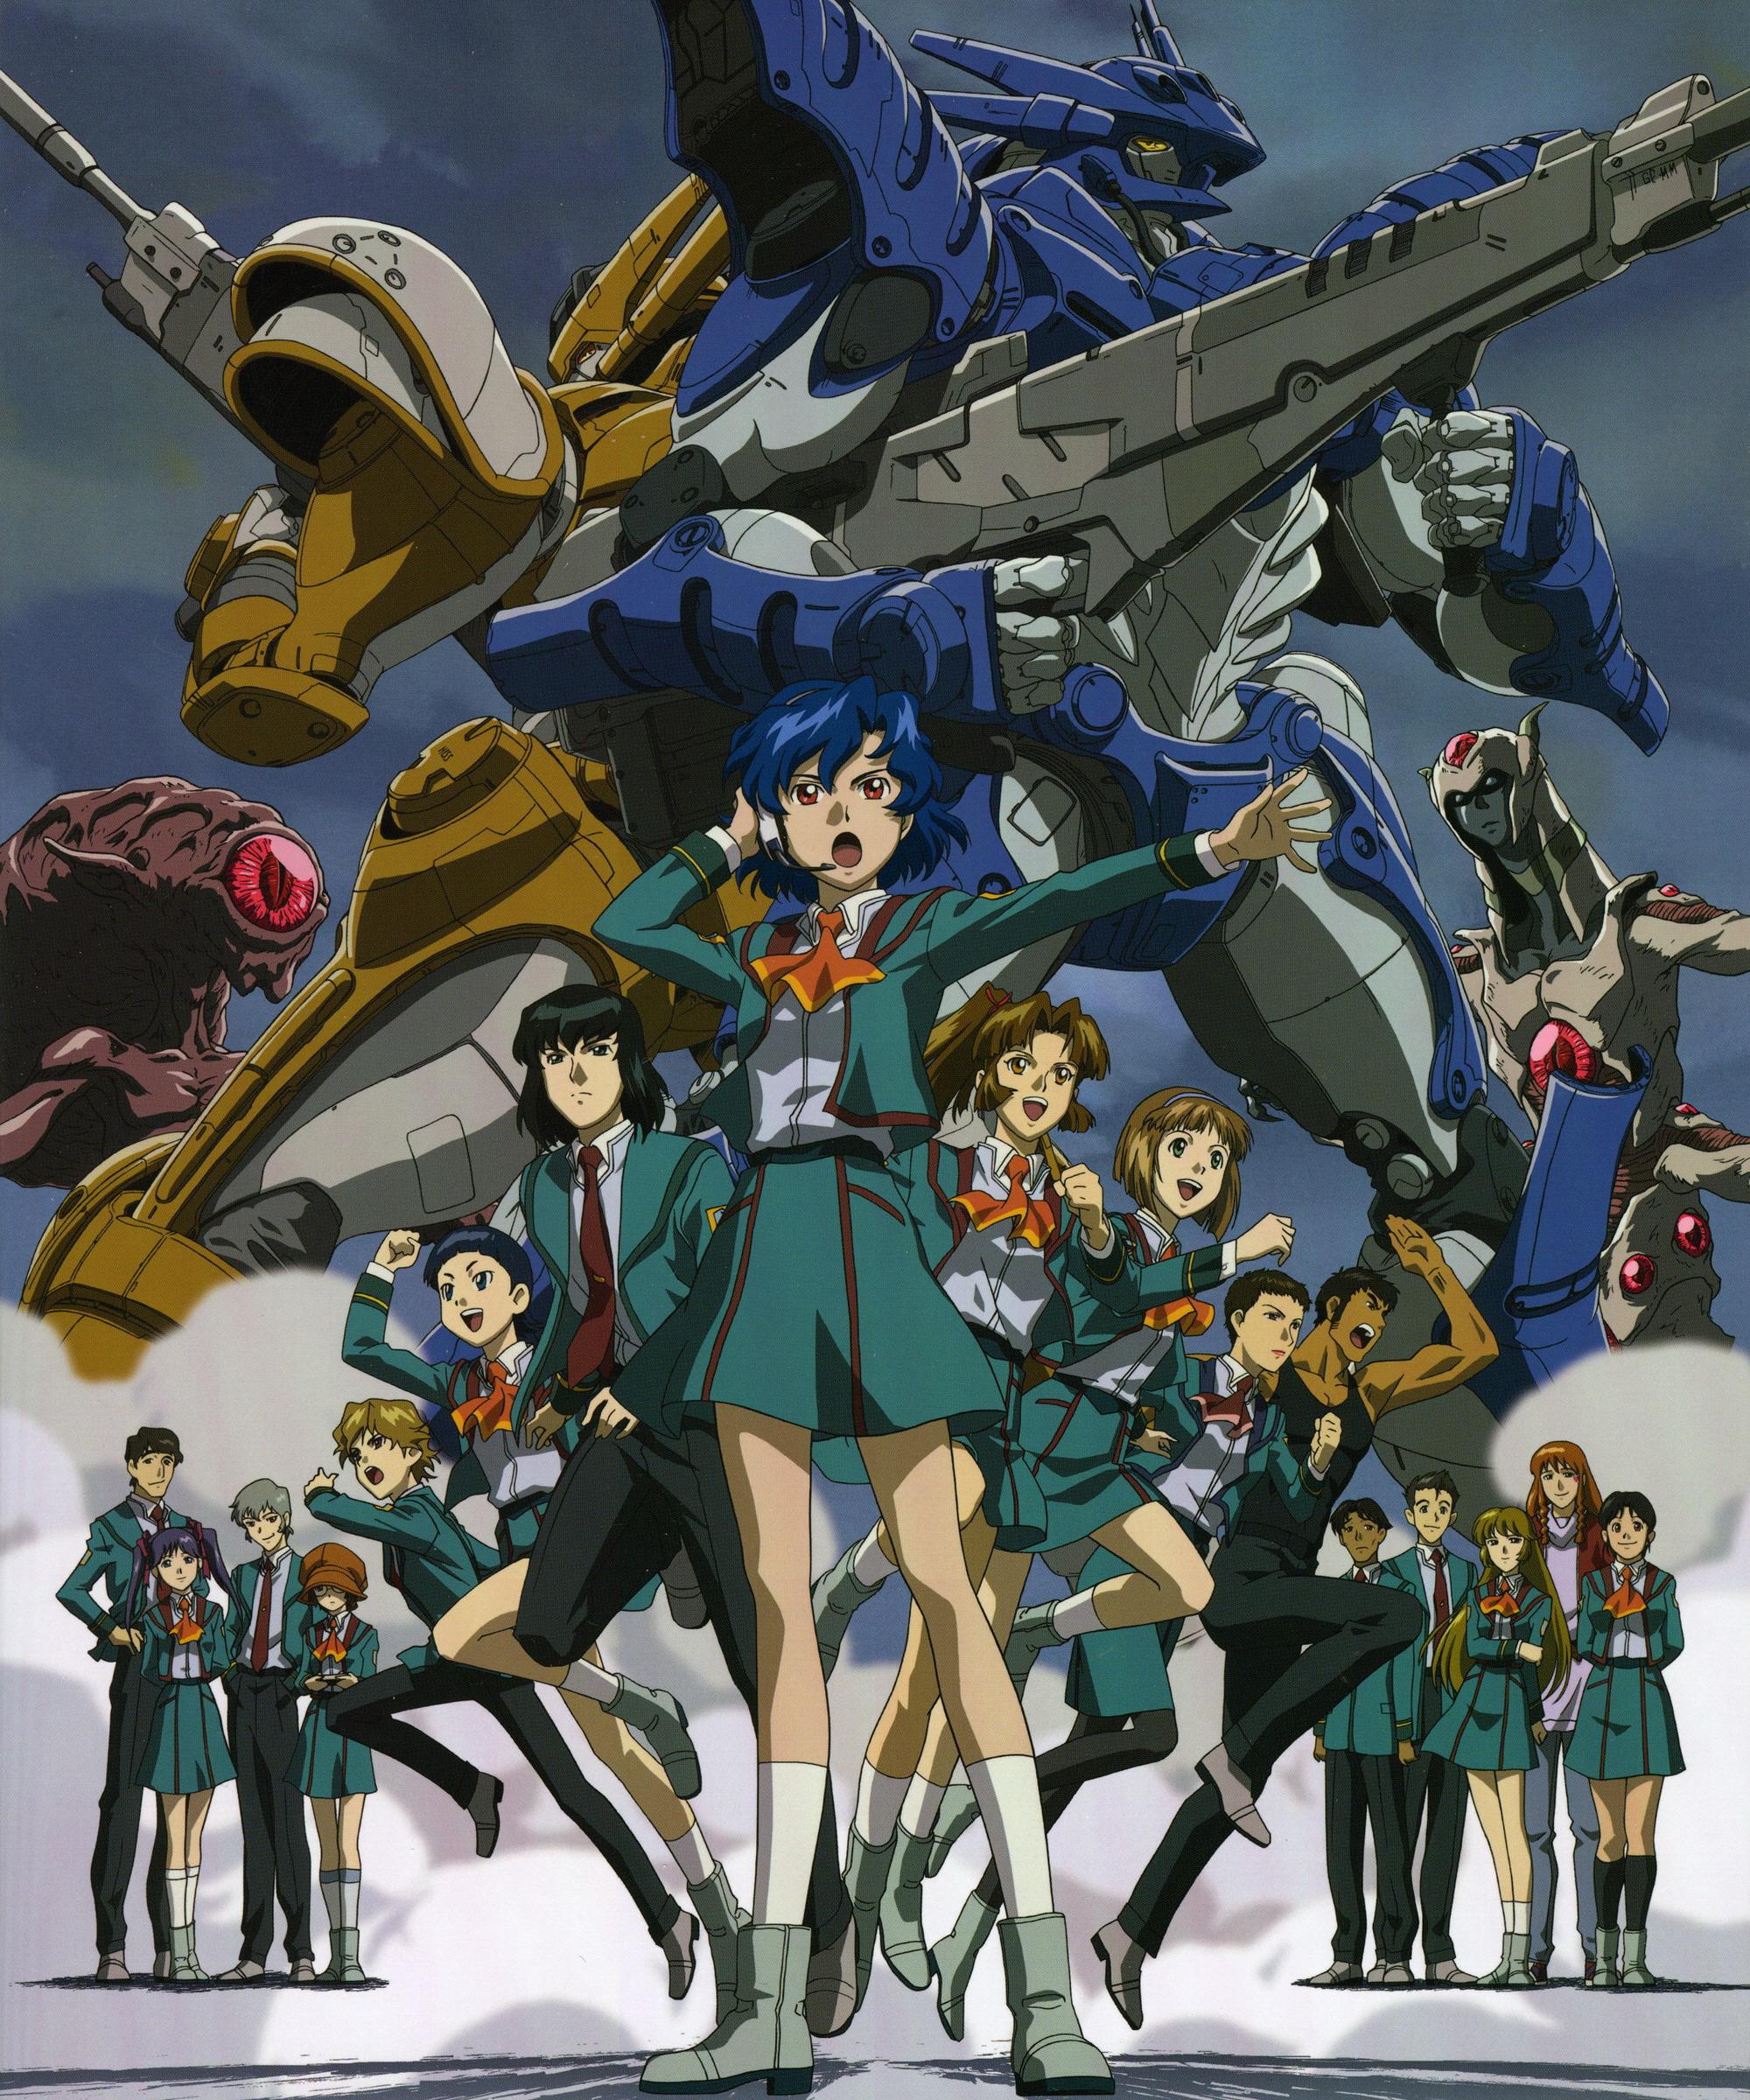 2005. Super Robot Wars Original Generation ...